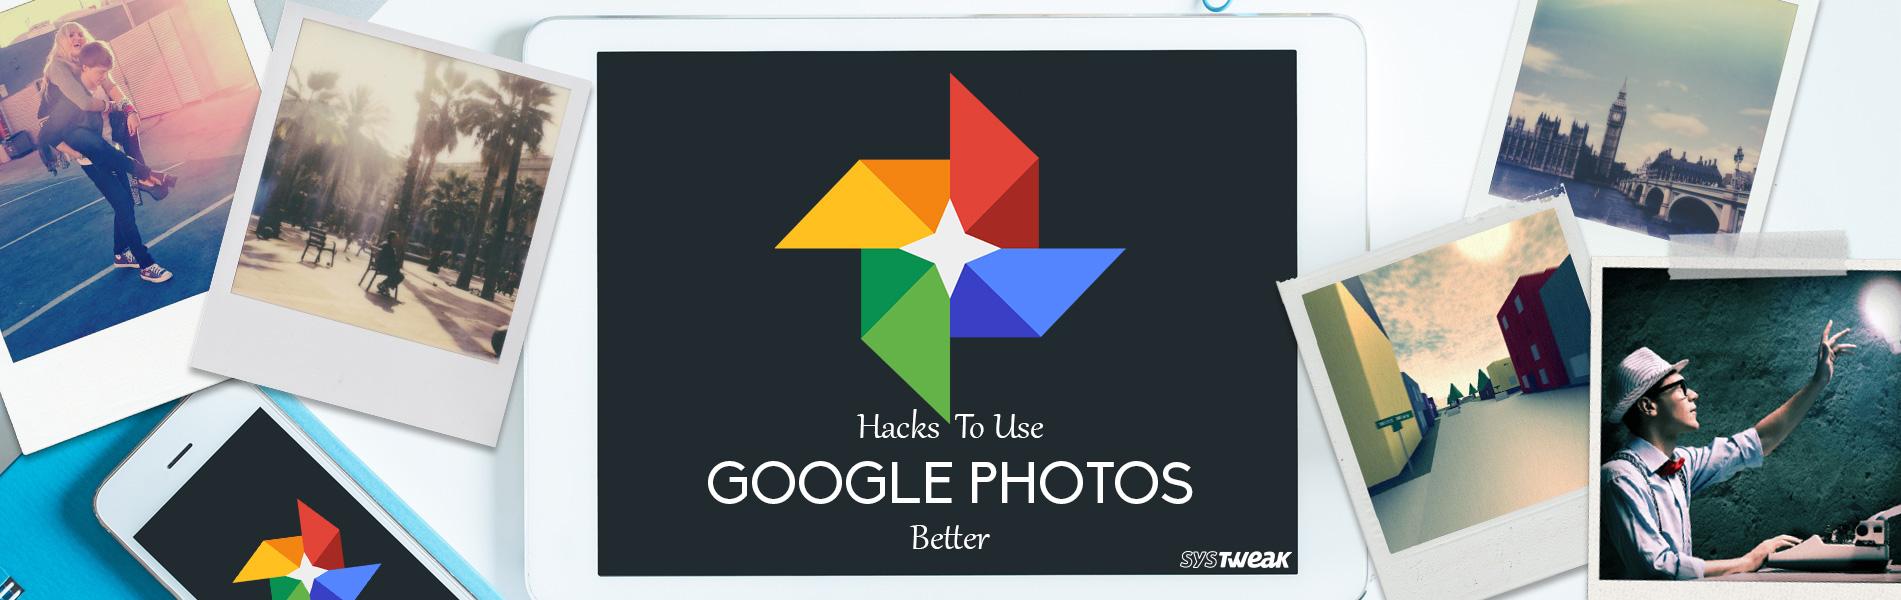 Tips and Tricks To Make You Master Google Photos